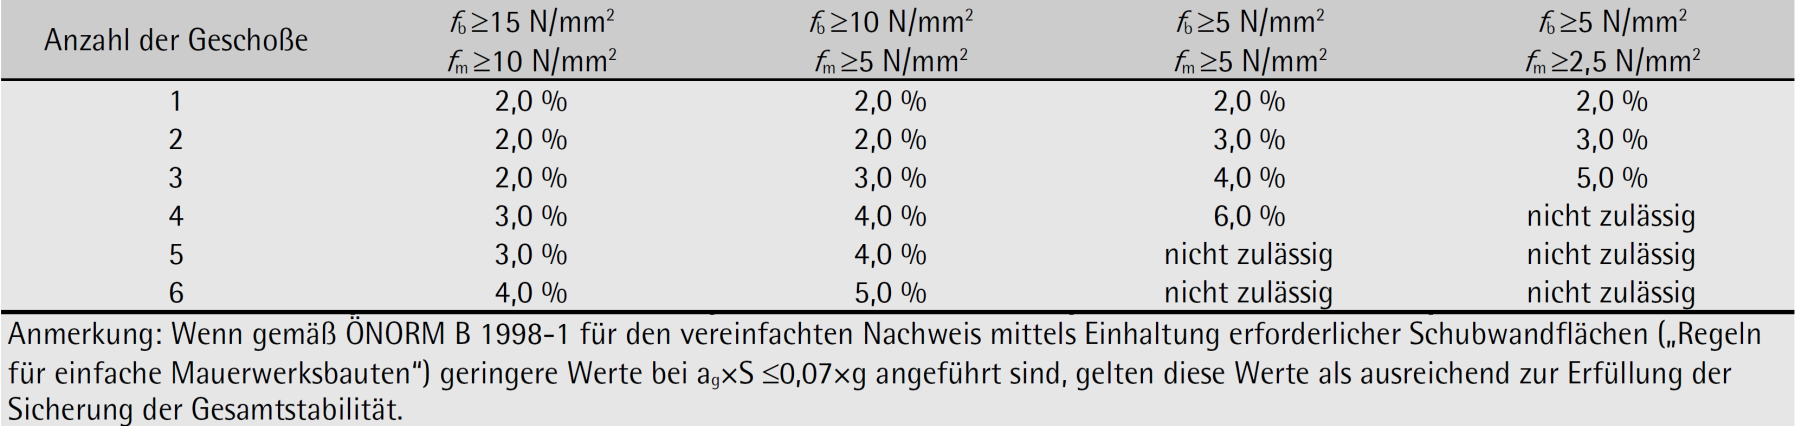 Tabelle 6-44: Mindestschub-Wandquerschnitte pro orthogonaler Richtung pA,min – ÖNORM B 1996-3